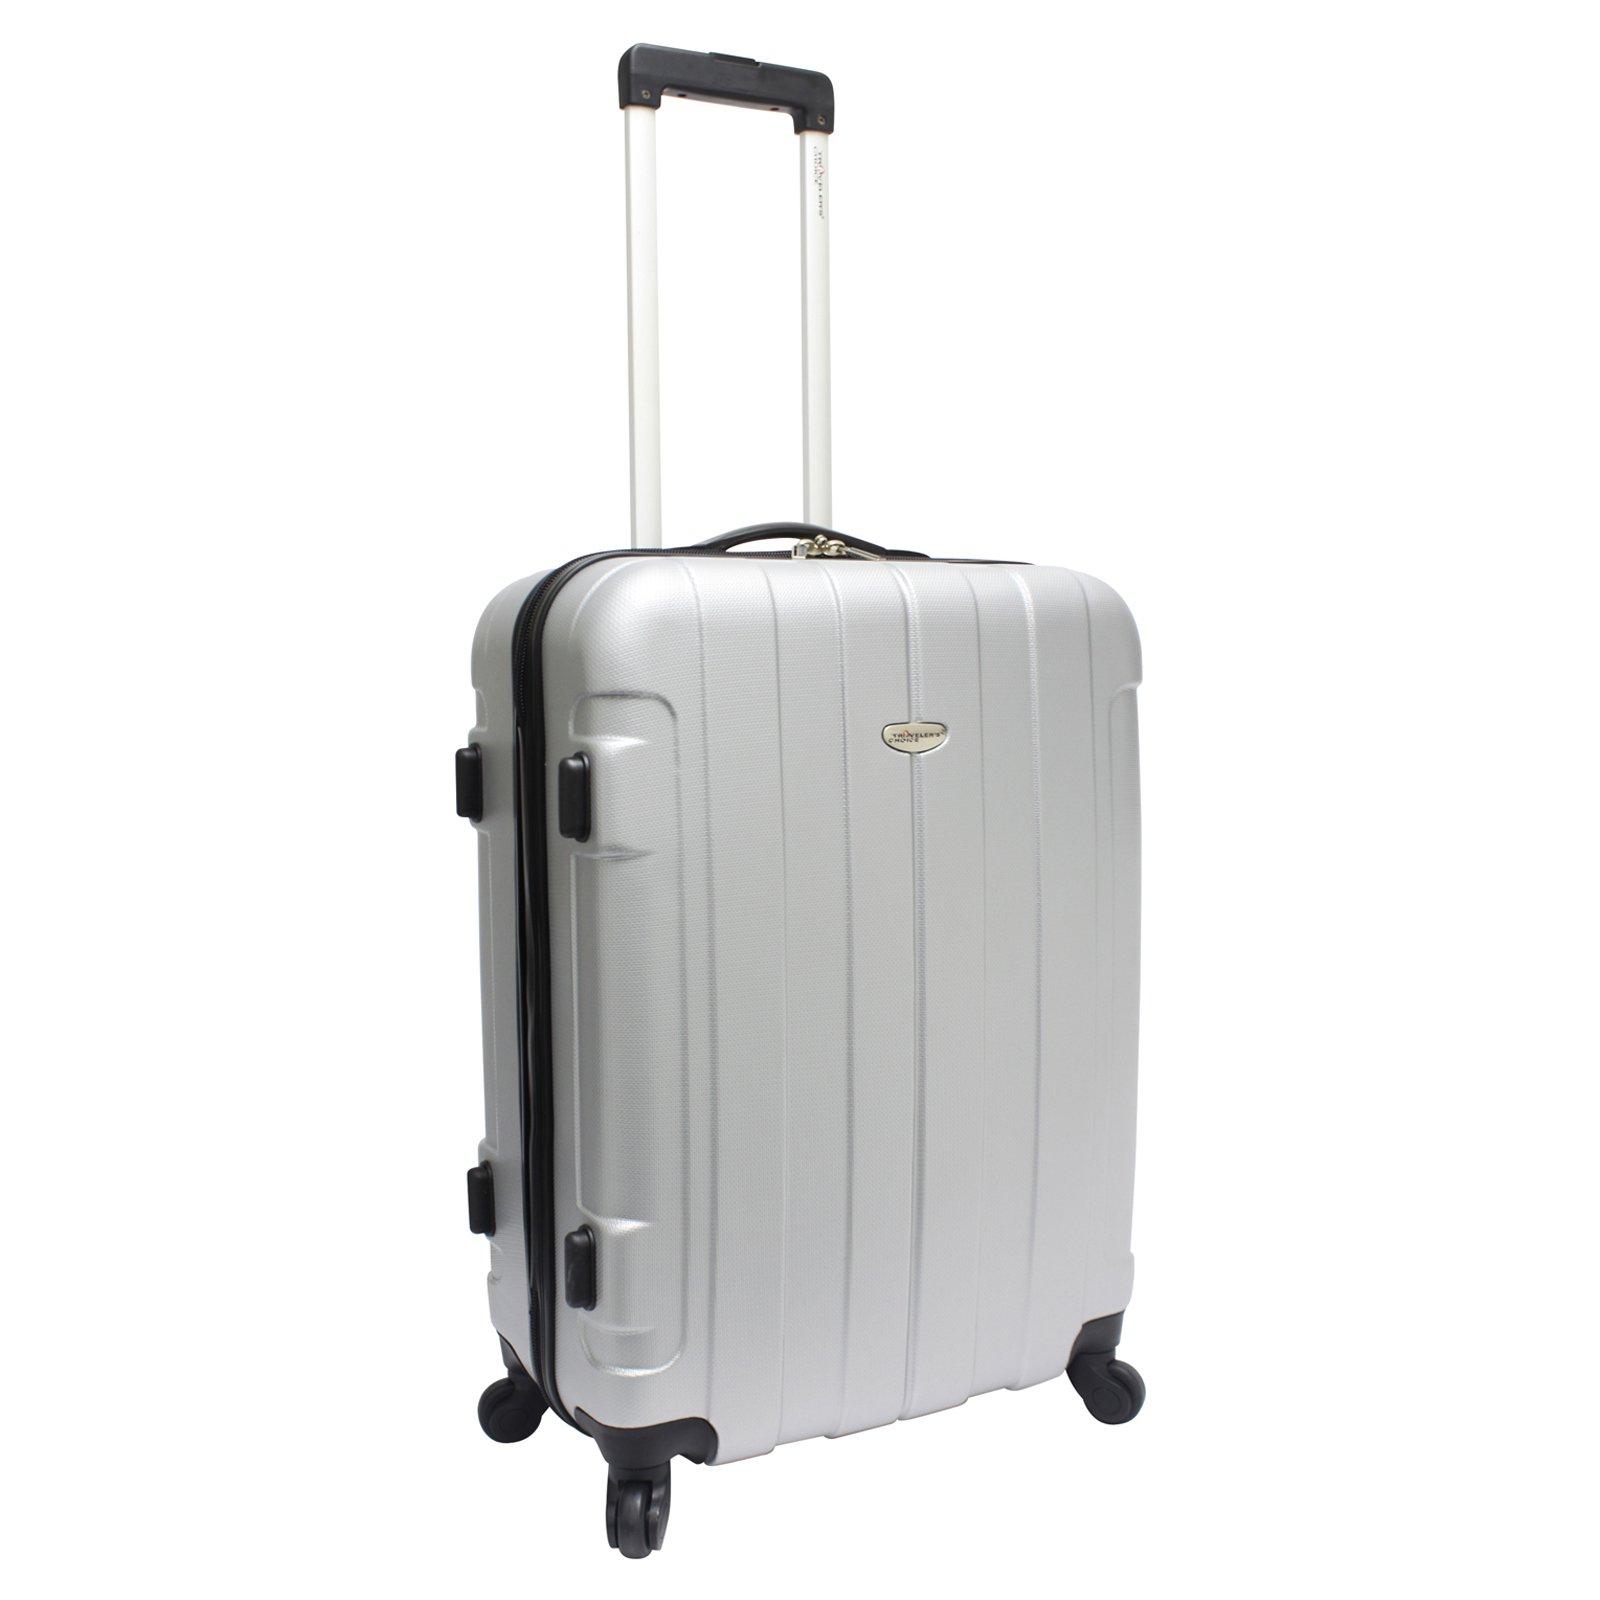 Traveler's Choice Rome 21'' Hard Shell Rolling Upright Luggage